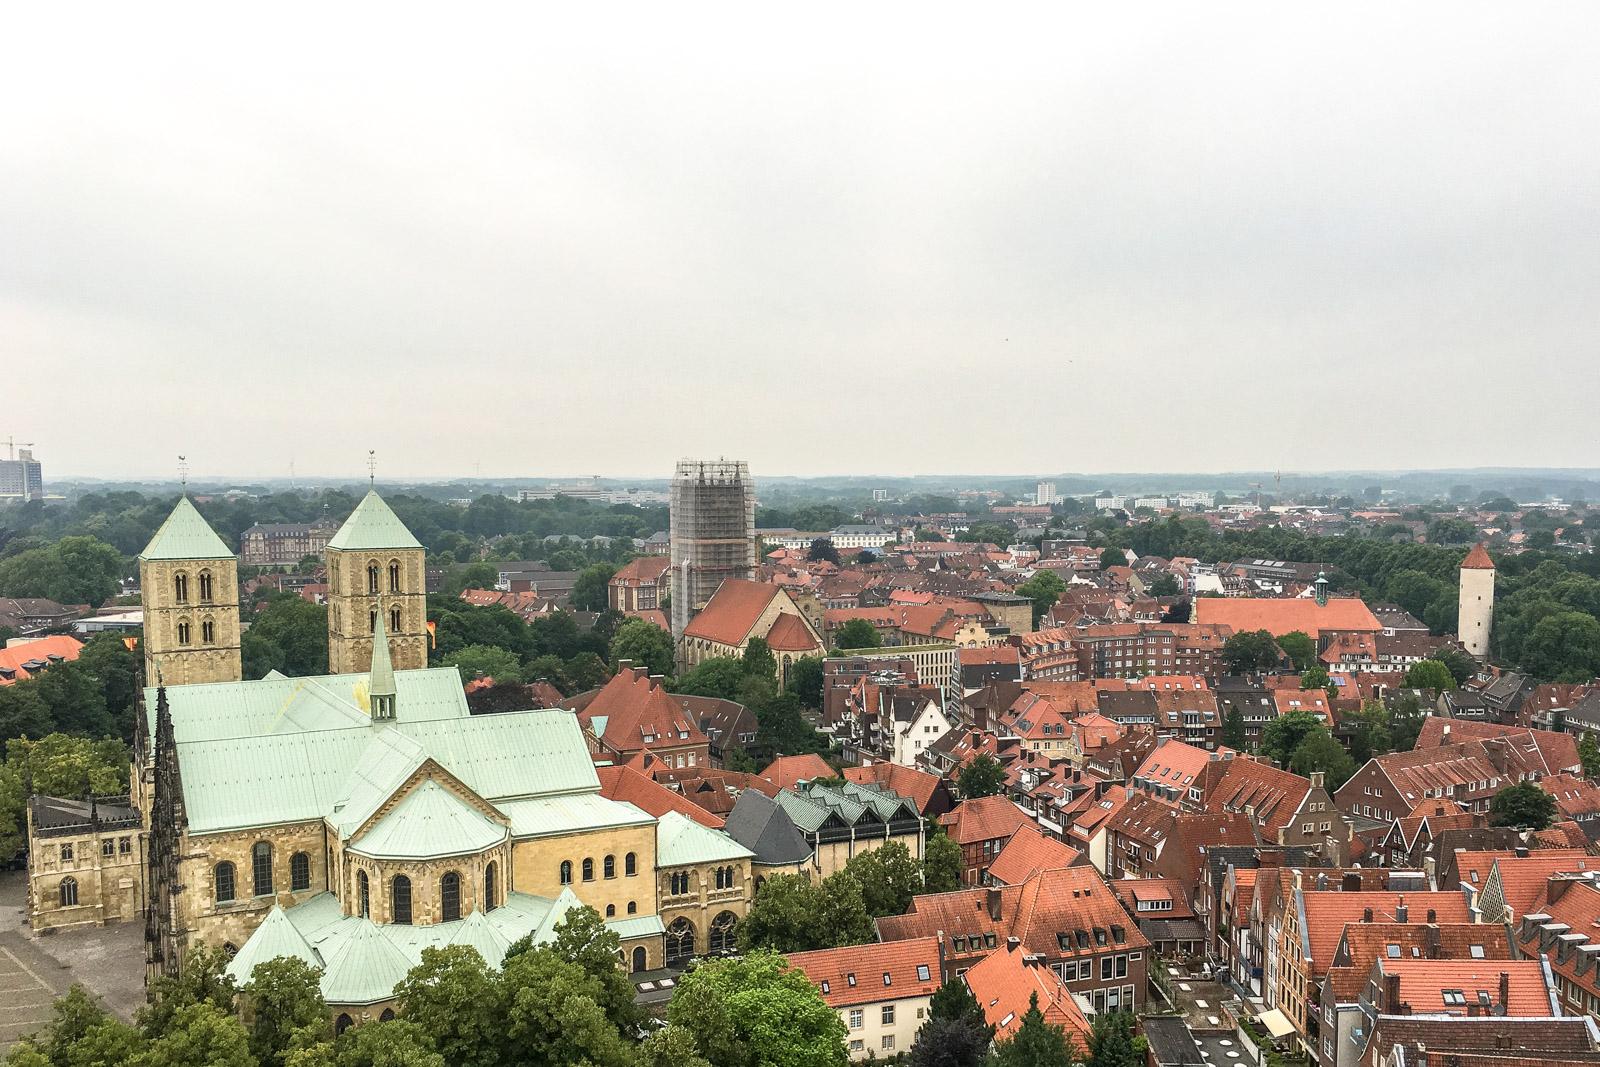 Turmbesichtigung Lamberti Kirche Münster, Türmerin Münster, Martje